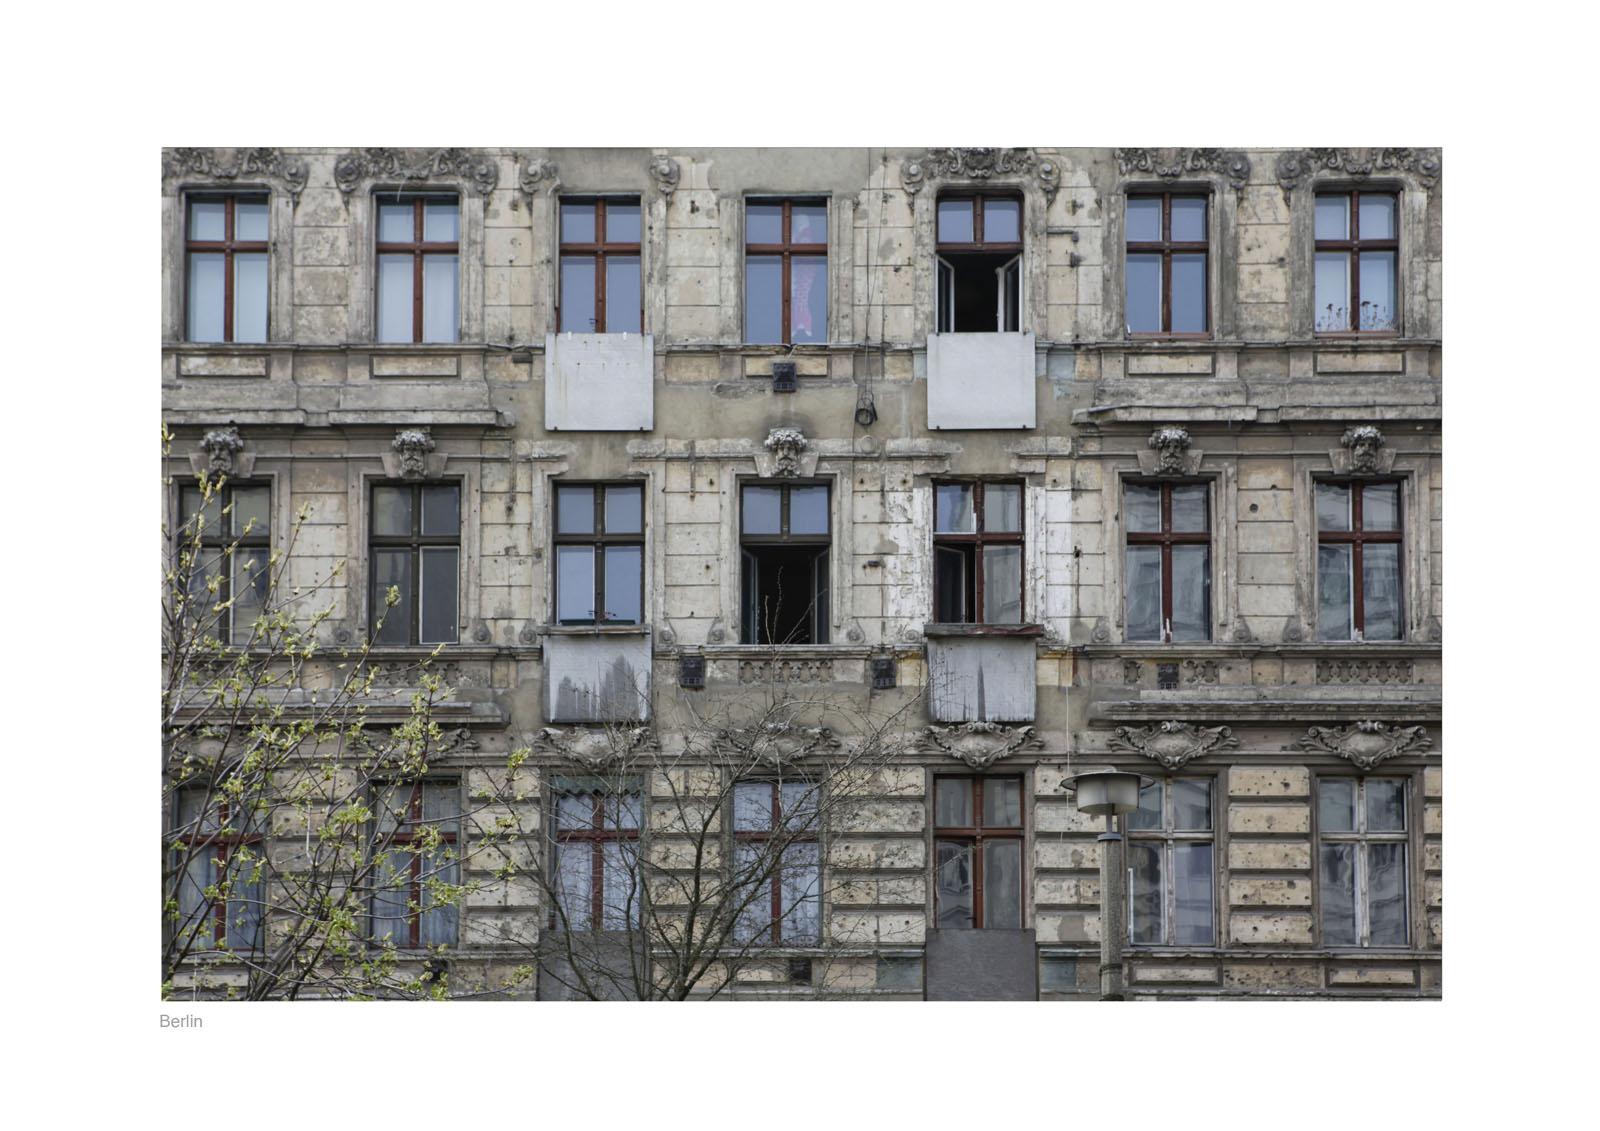 005-Norsic-urbanisme-002